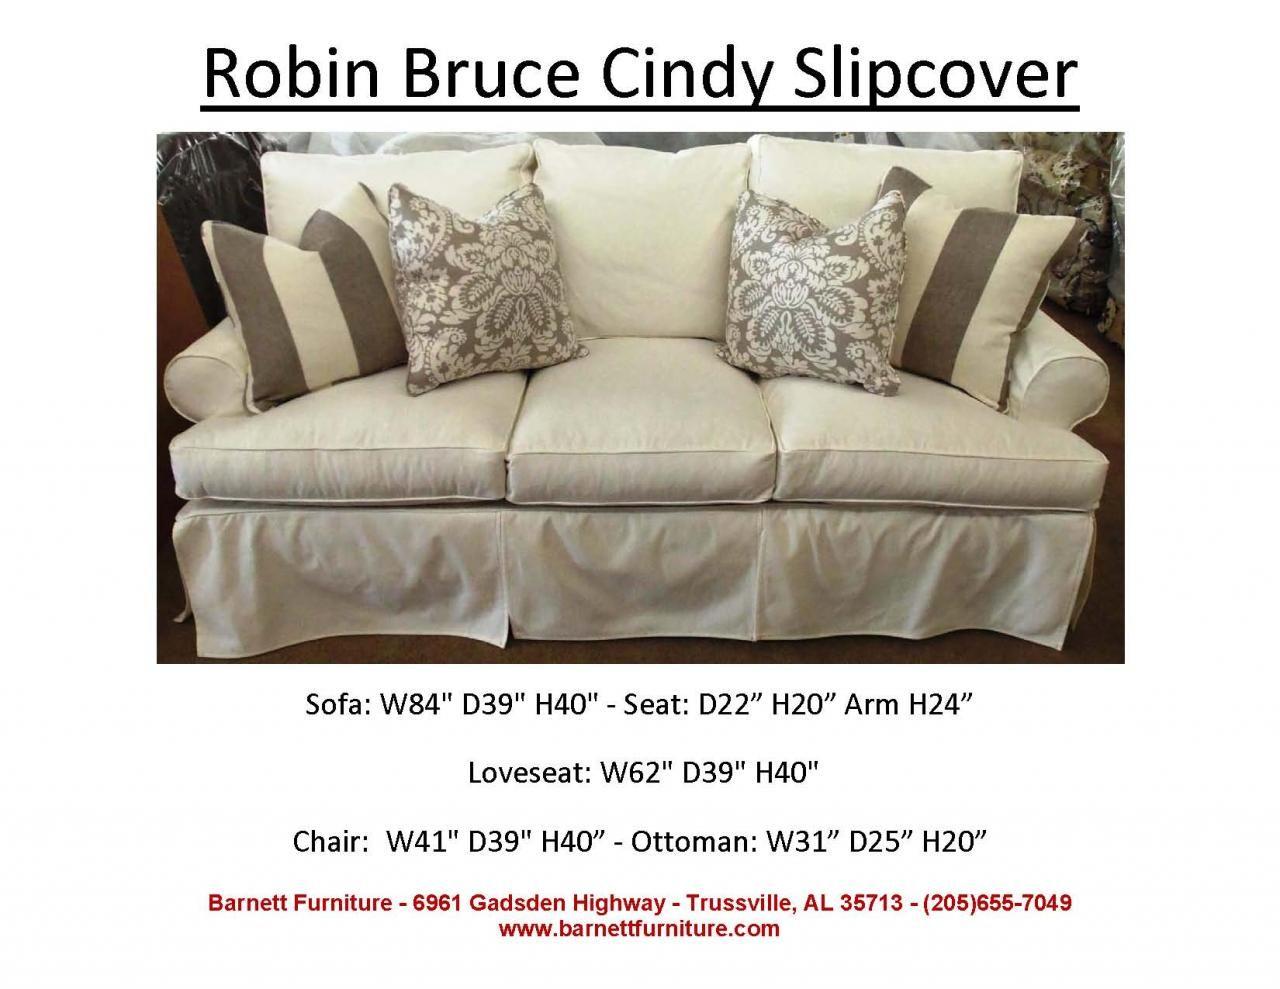 Nantucket 2 seat slipcover queen sleeper sofa rowe furniture rowe - Robin Bruce Cindy Slipcover Sofa You Choose The Fabric